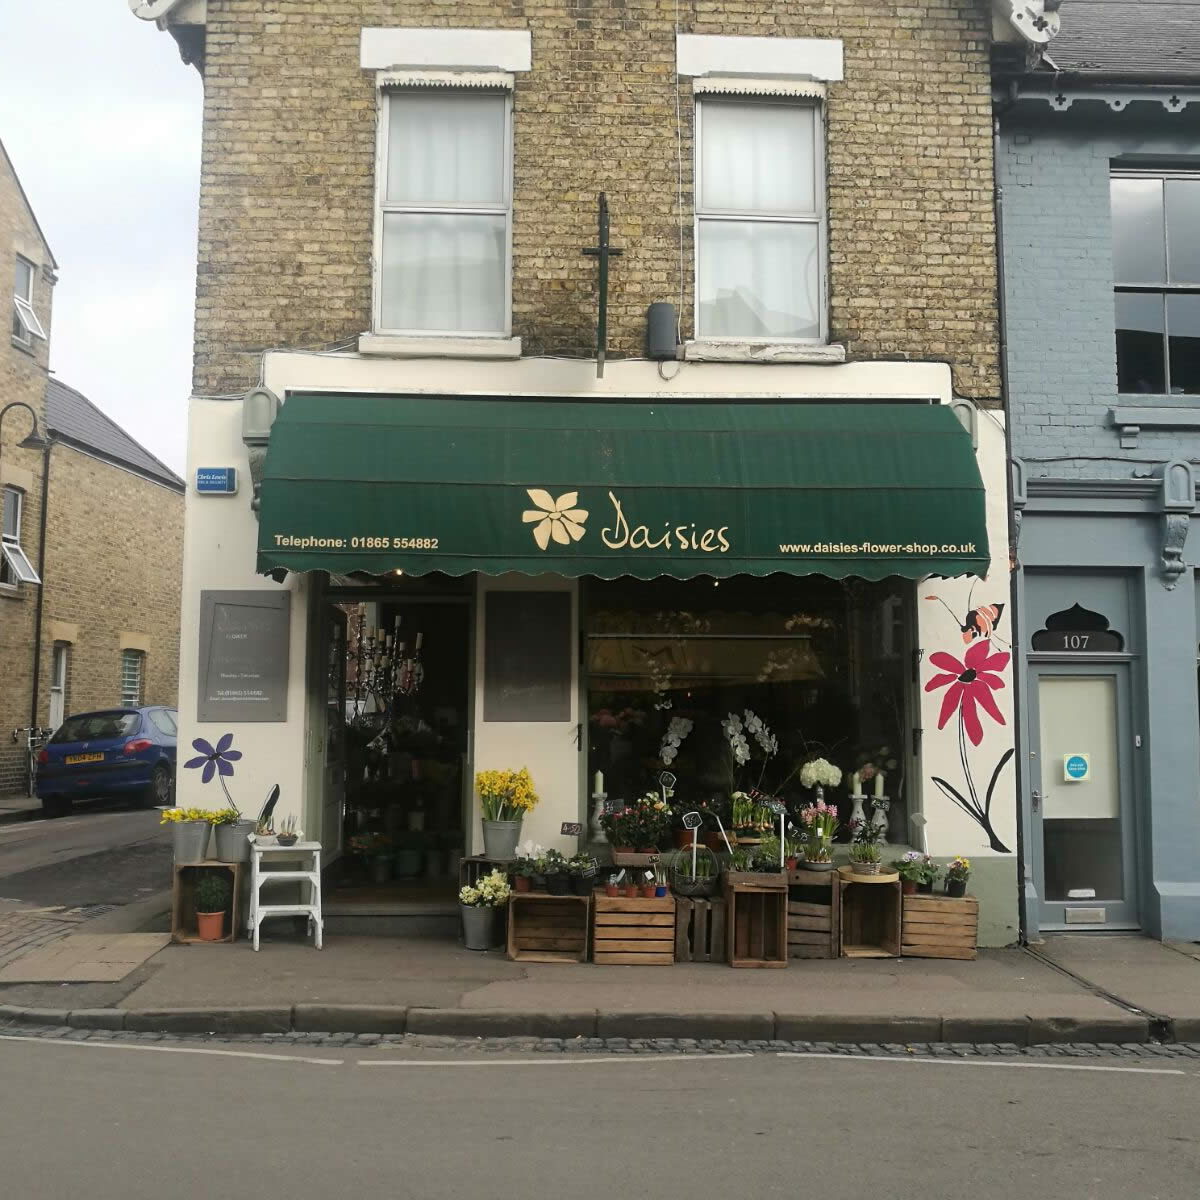 Daisies flower shop daisiesoxford twitter 0 replies 2 retweets 1 like izmirmasajfo